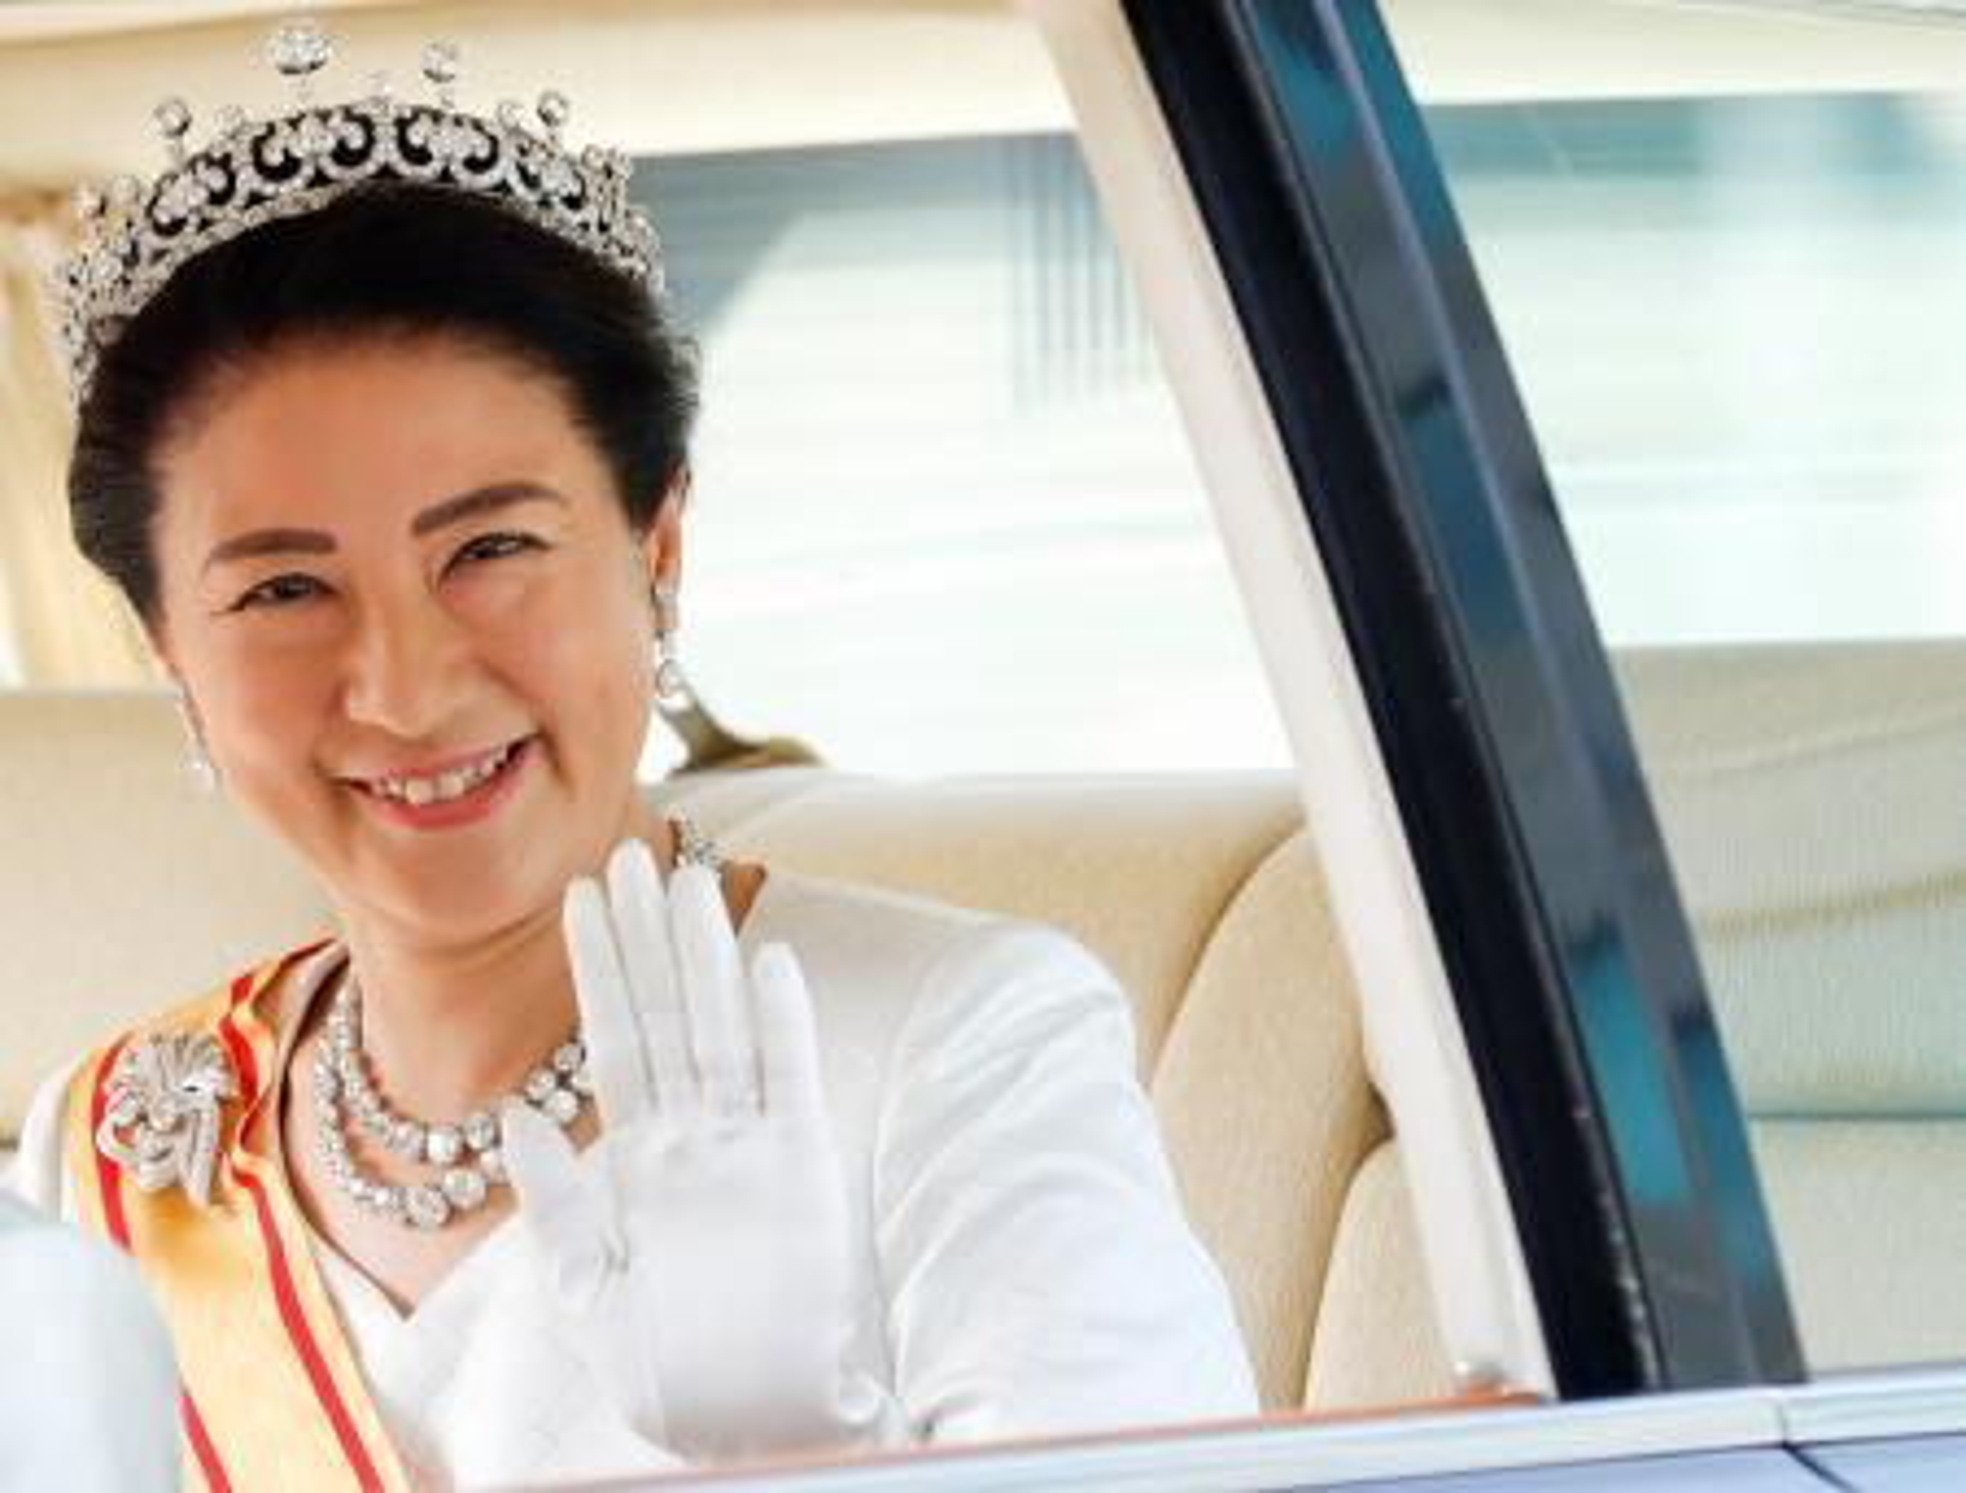 Japan's new Empress Masako